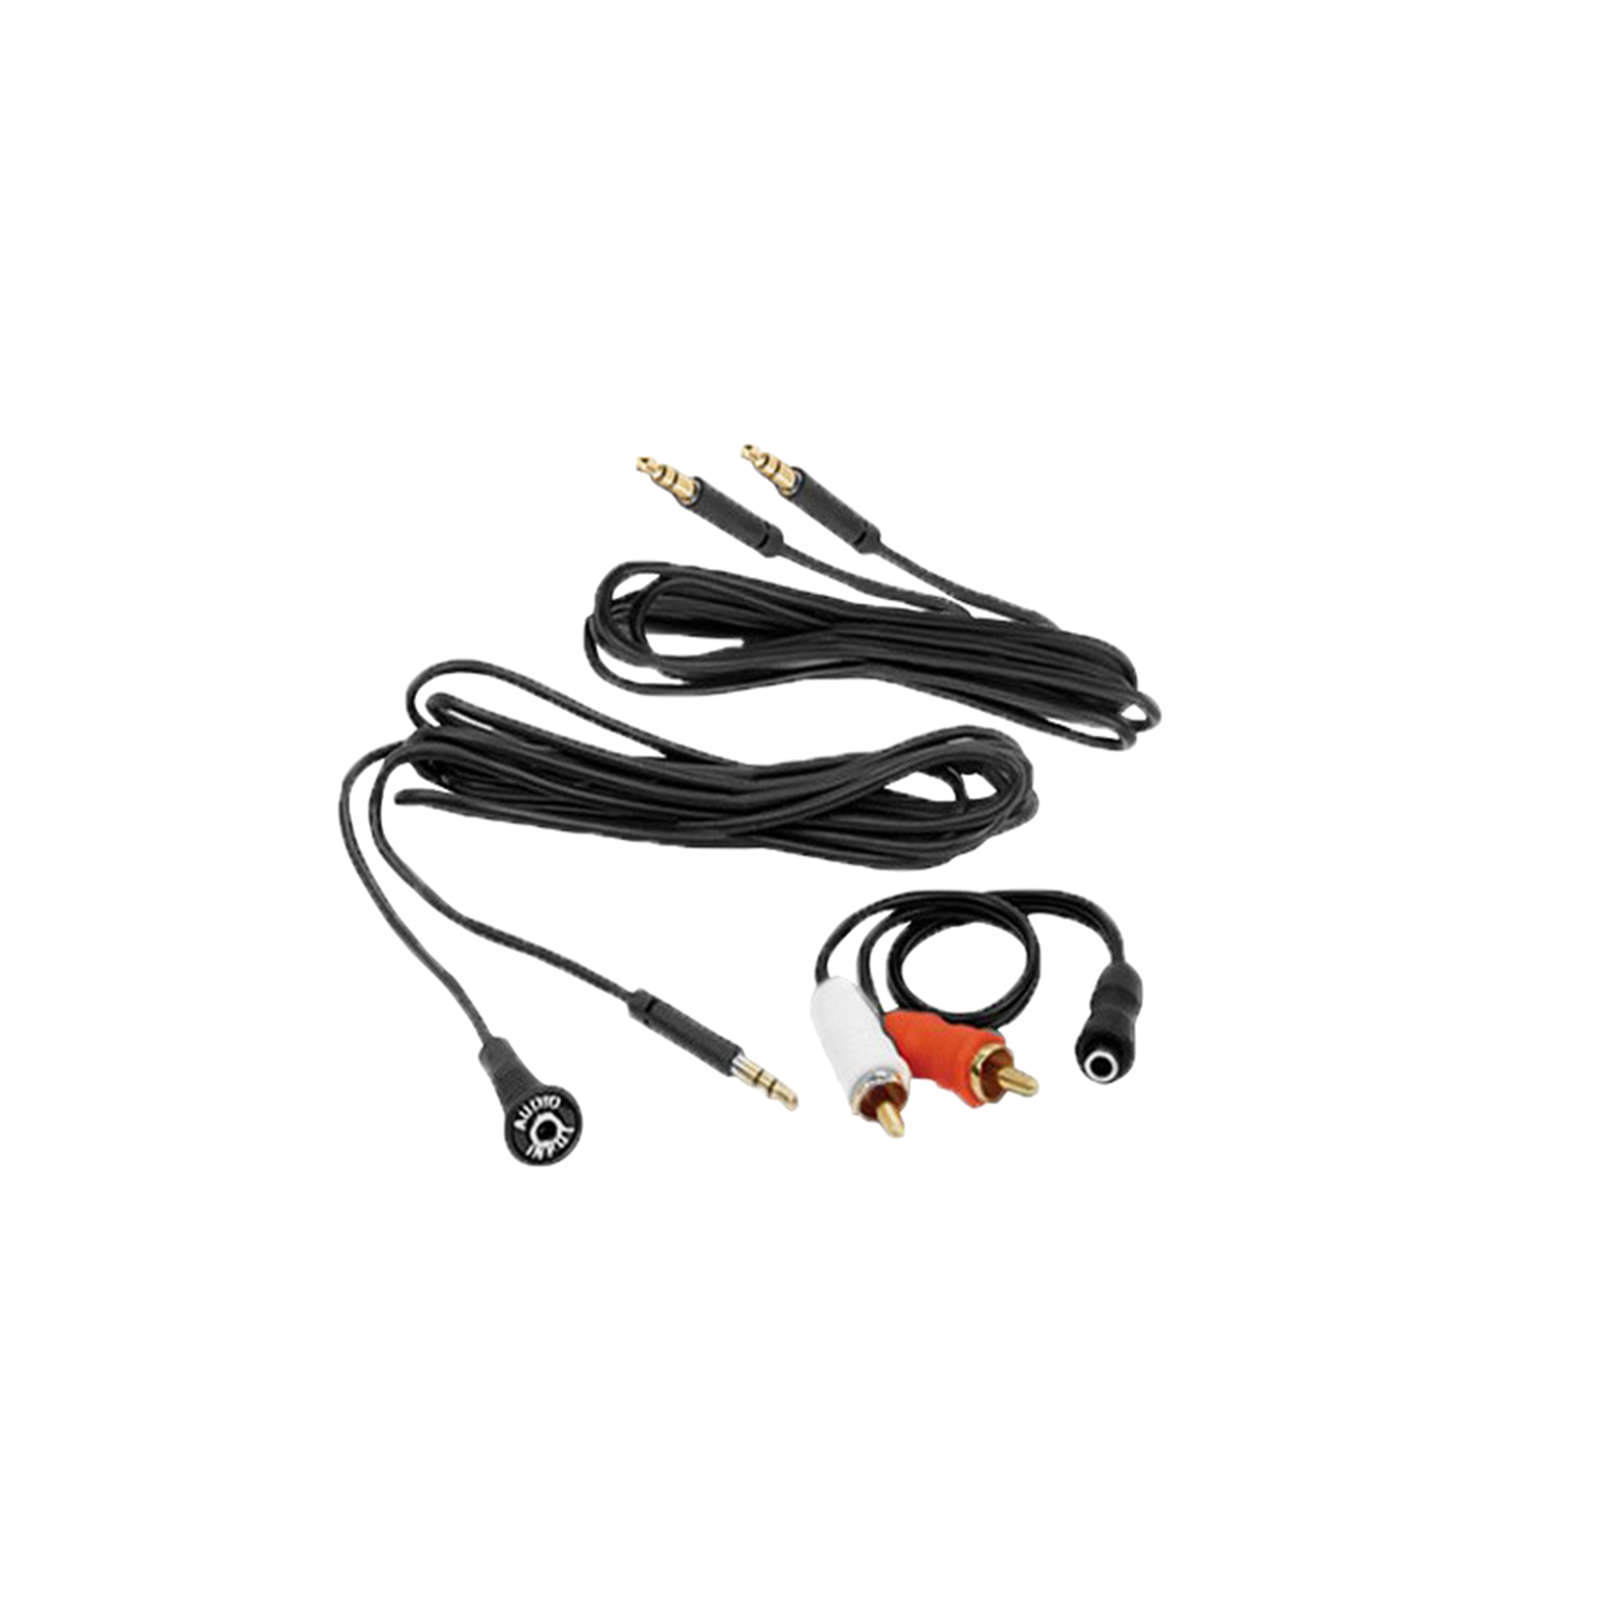 PAC IS335 Dash Mount AUX 3.5mm Headphone Jack Smartphone